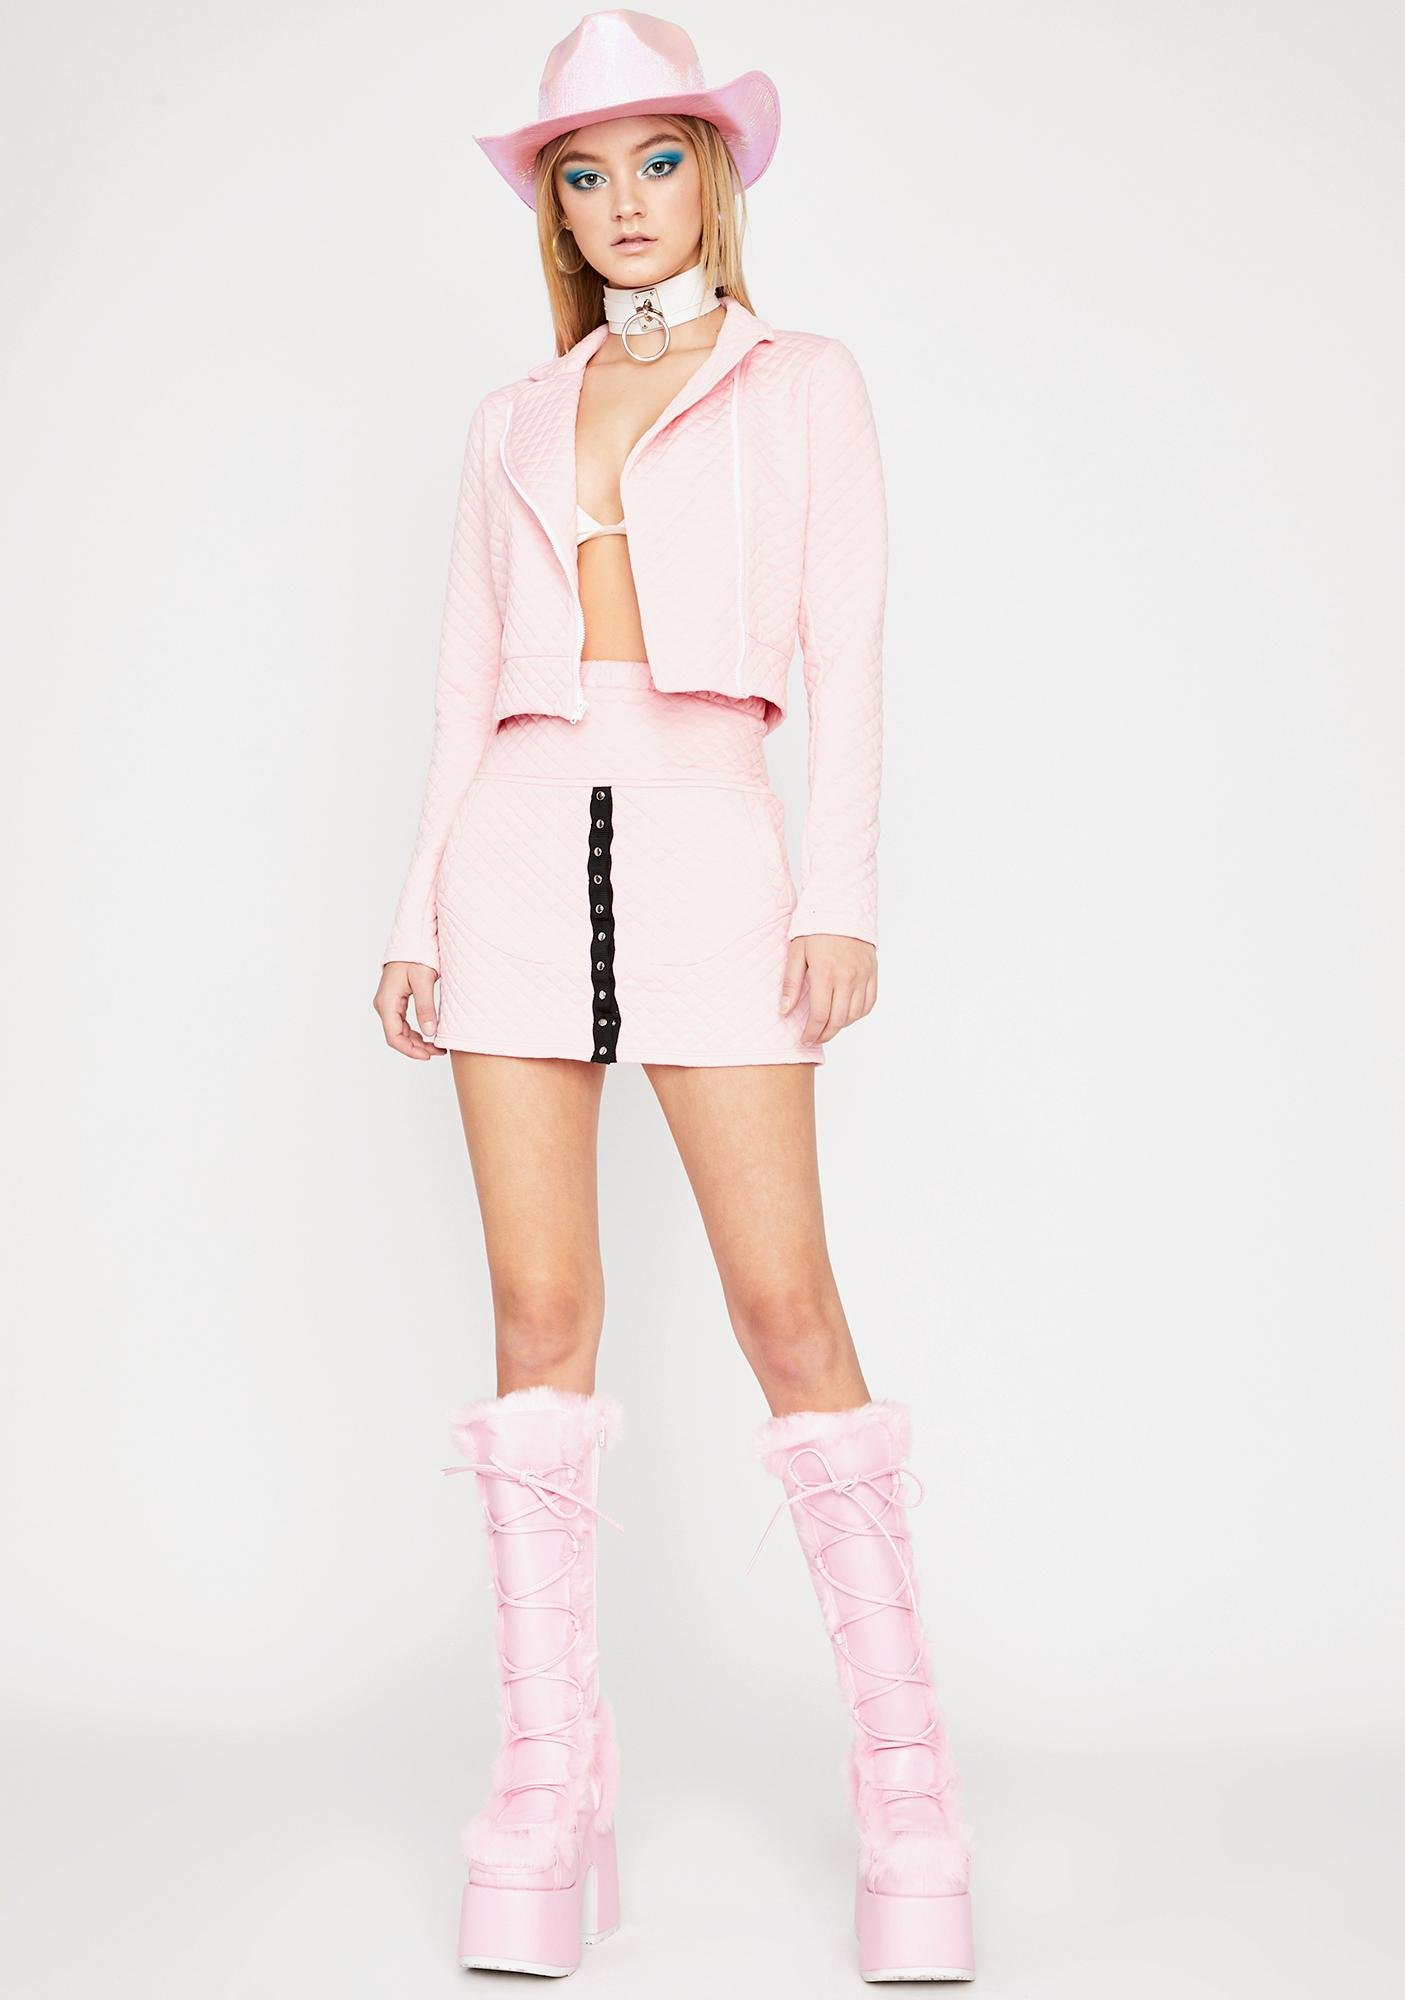 Baby Gotta Bounce Mini Skirt